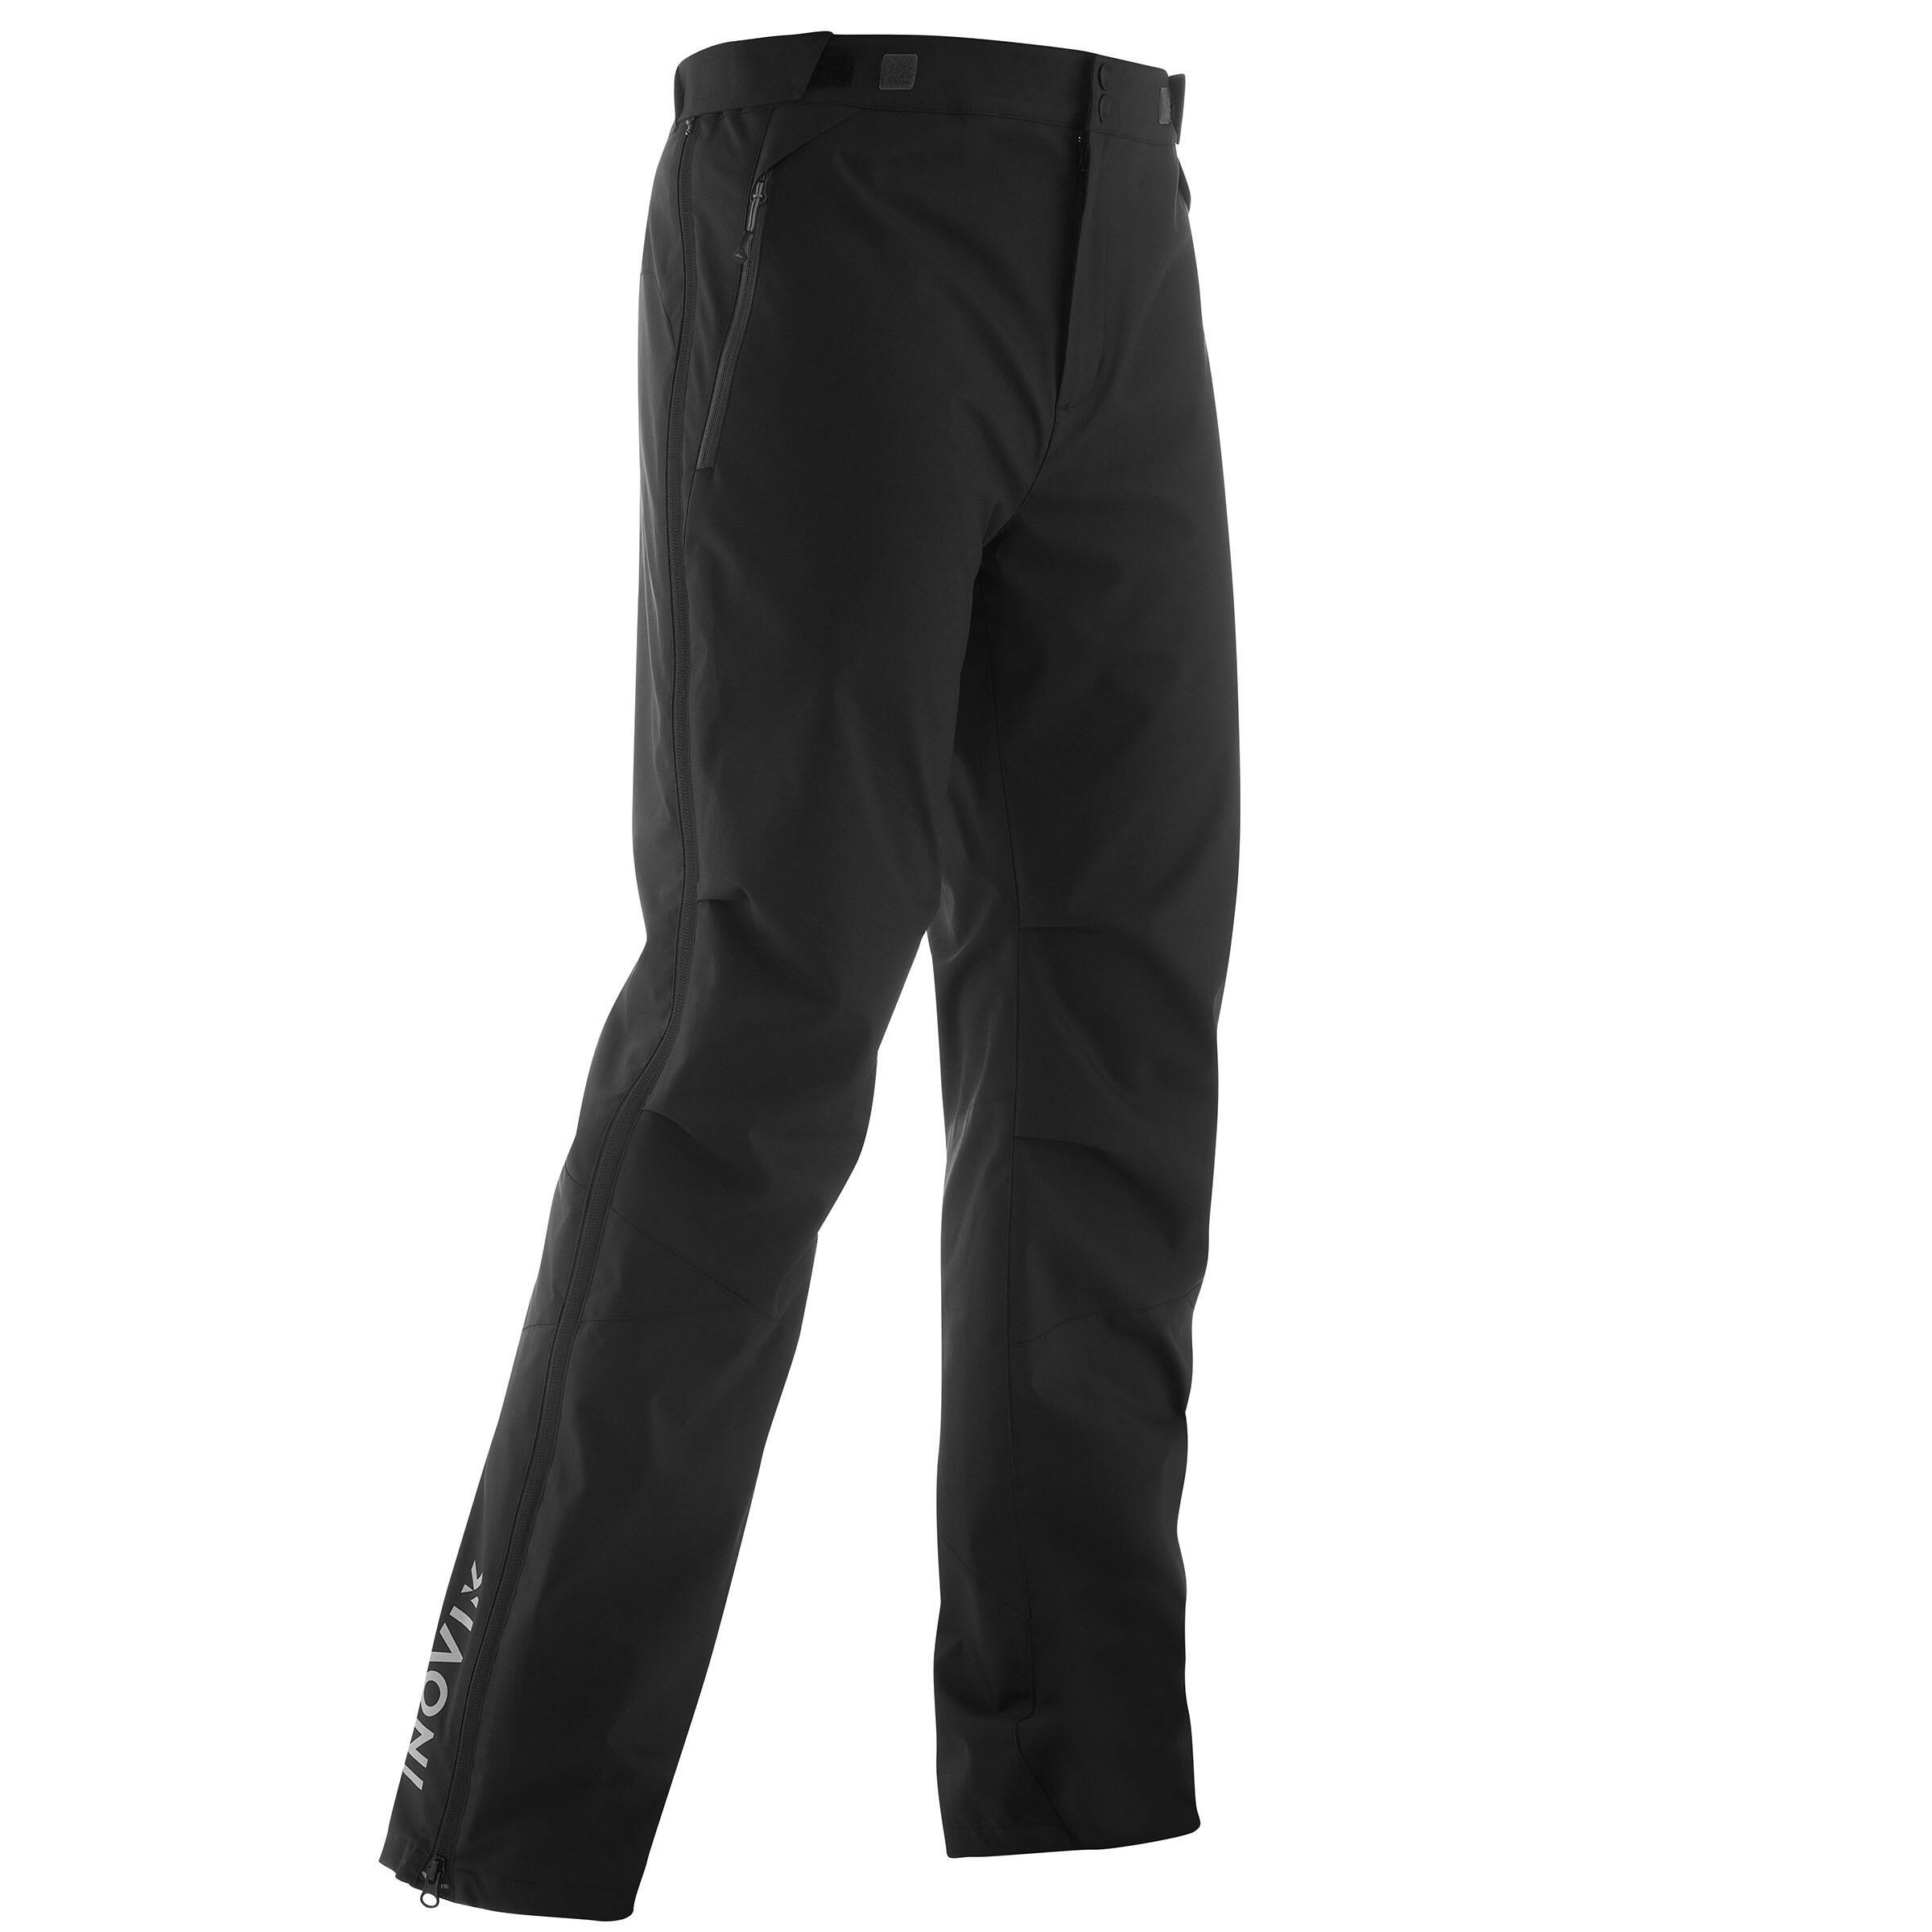 Langlaufhose XC S 150 Überhose Herren | Sportbekleidung > Sporthosen > Laufhosen | Inovik